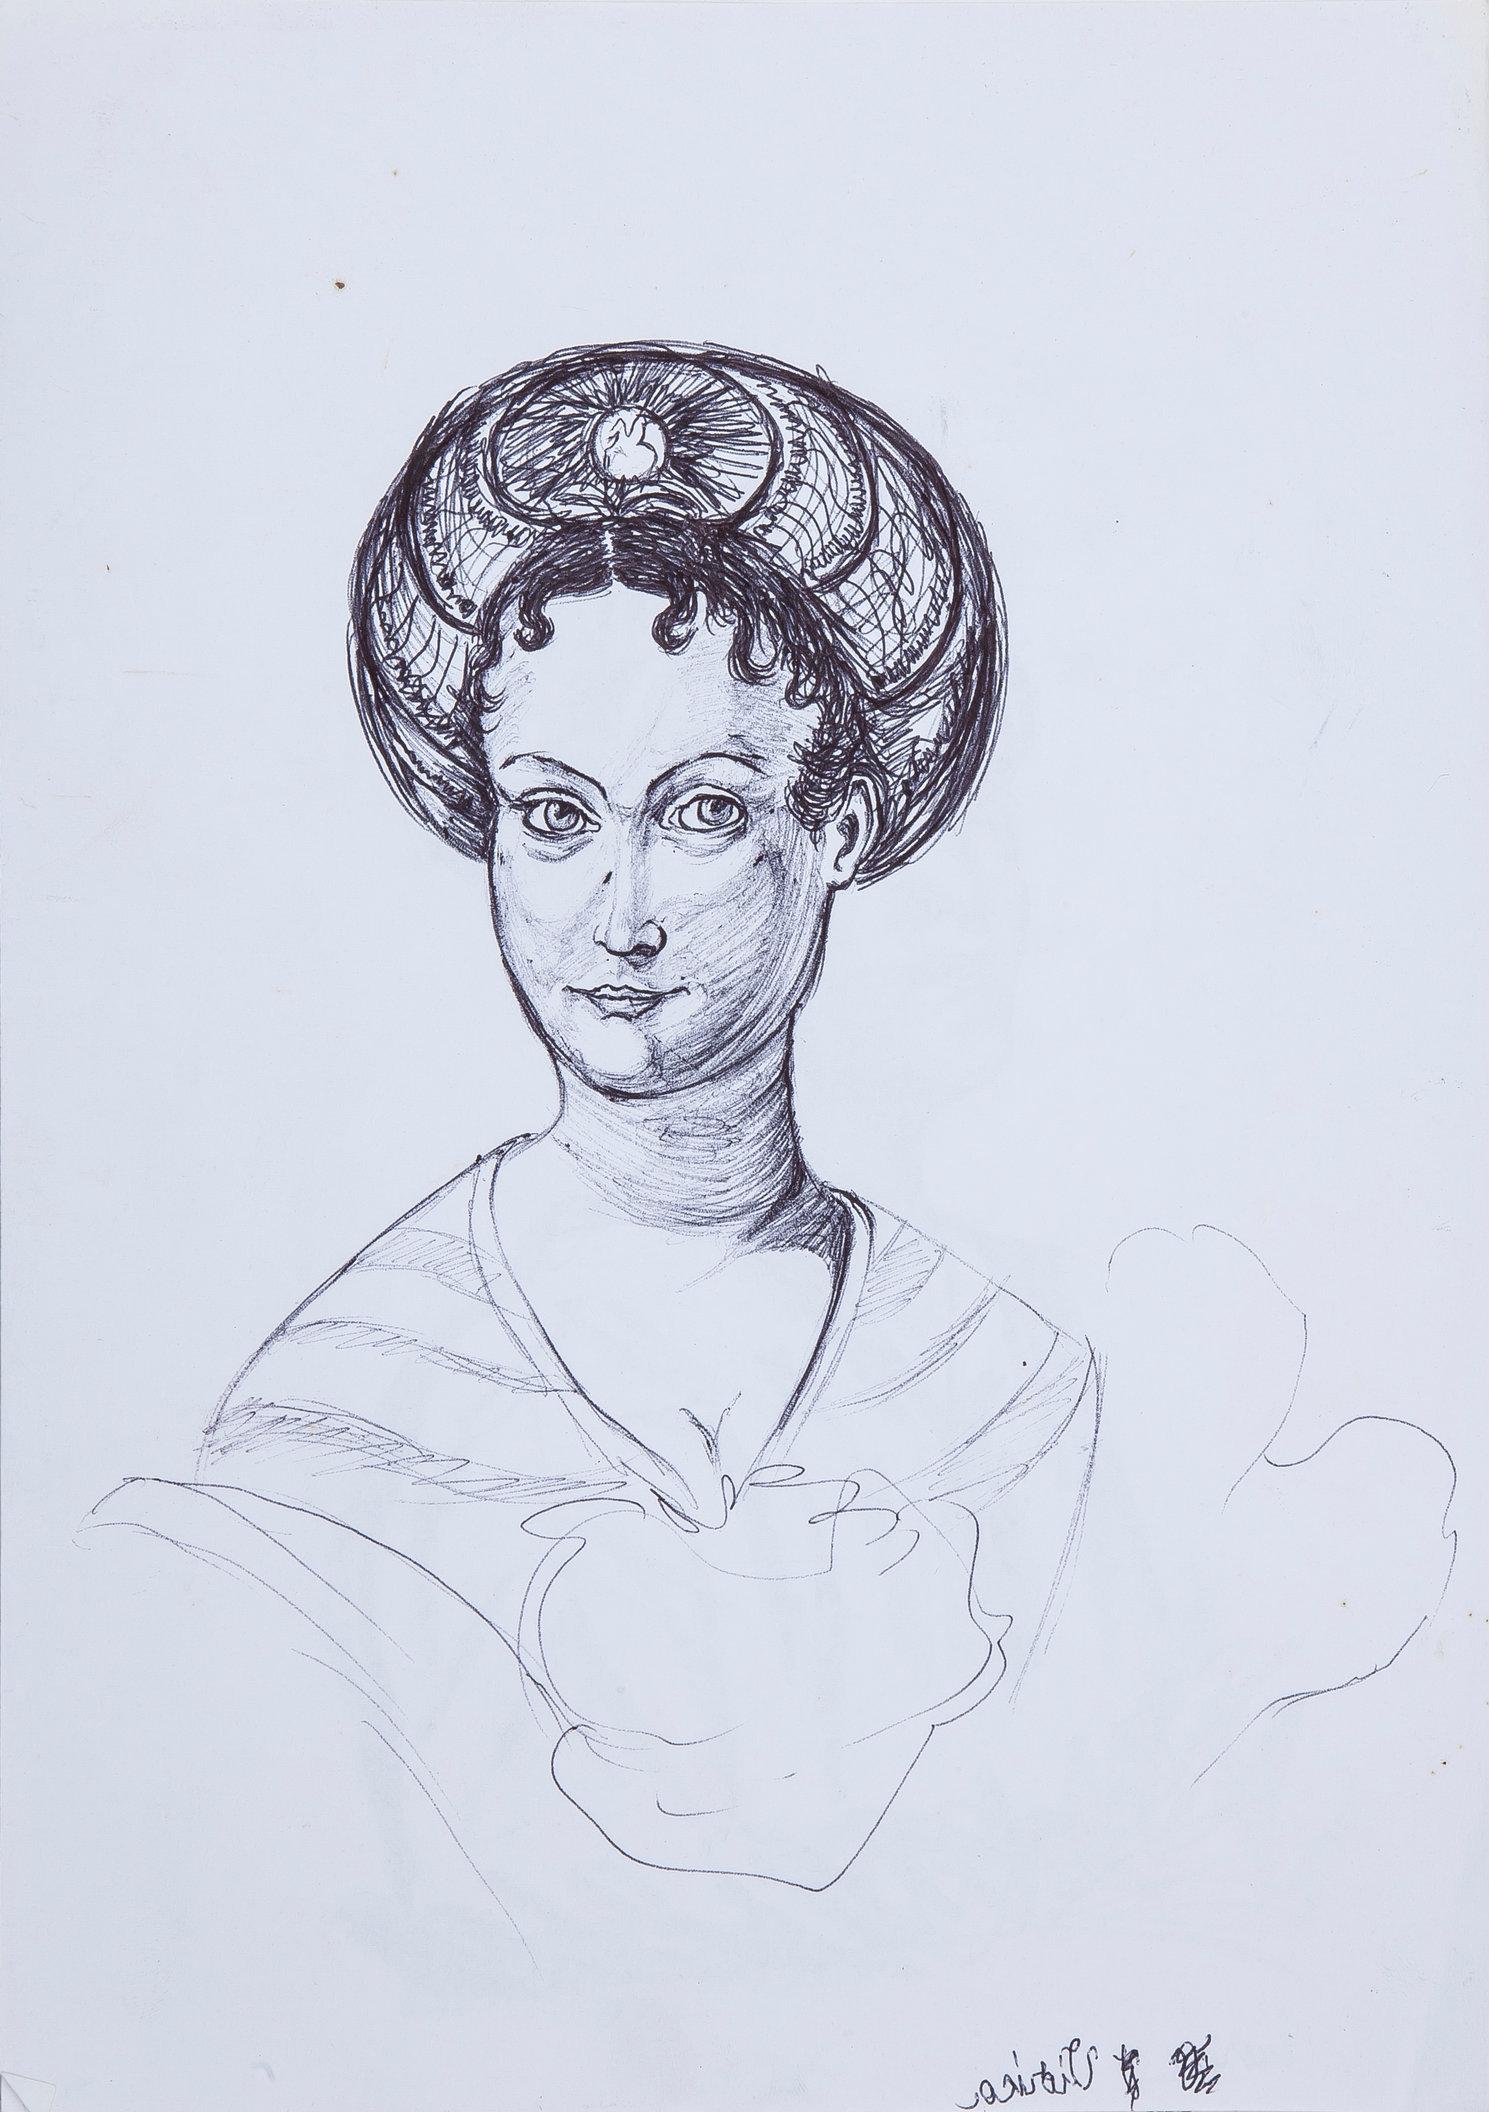 Woman 1 - Study (Left Hand Made)